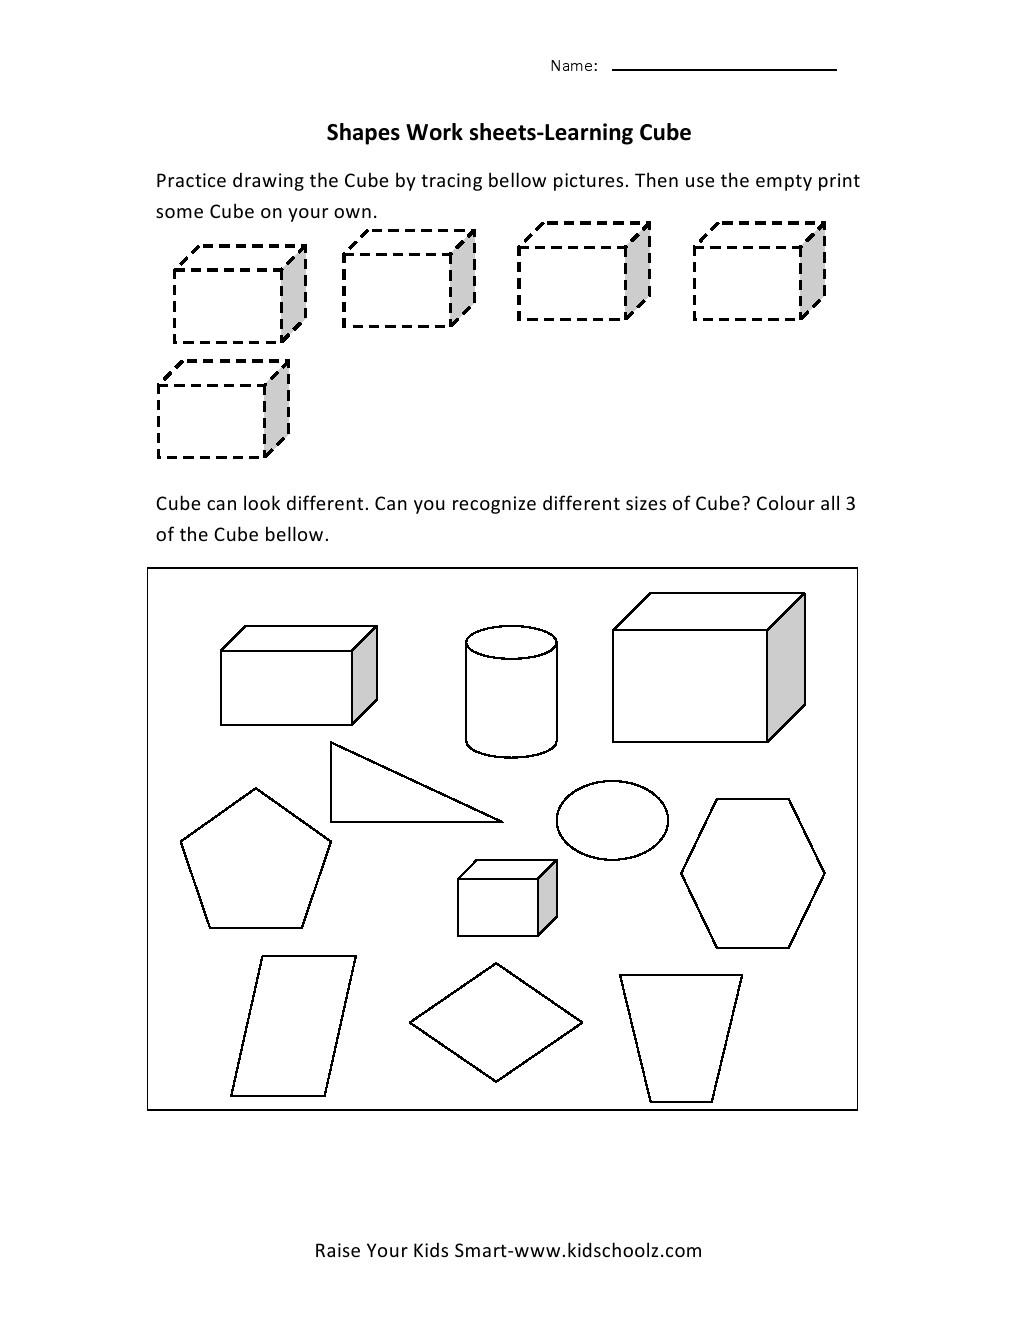 Workbooks shapes tracing worksheets preschool : Learning Shapes Worksheets - Cube - Kidschoolz